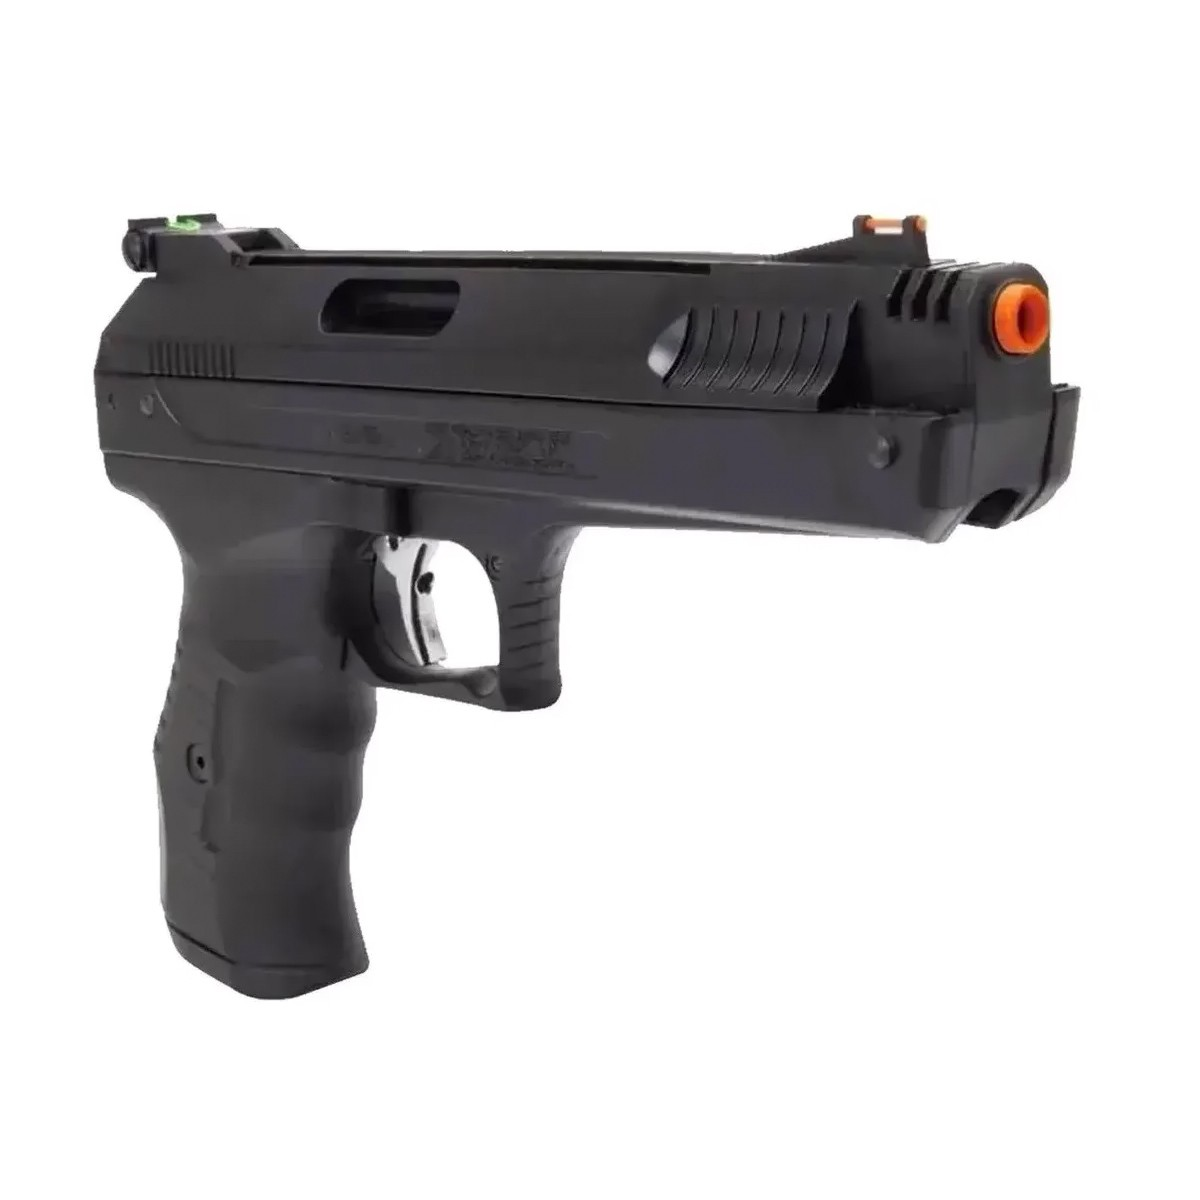 Pistola de Pressão Chumbinho Beeman 2004 Airgun 4.5mm + 2 Pack de chumbinho 4.5mm